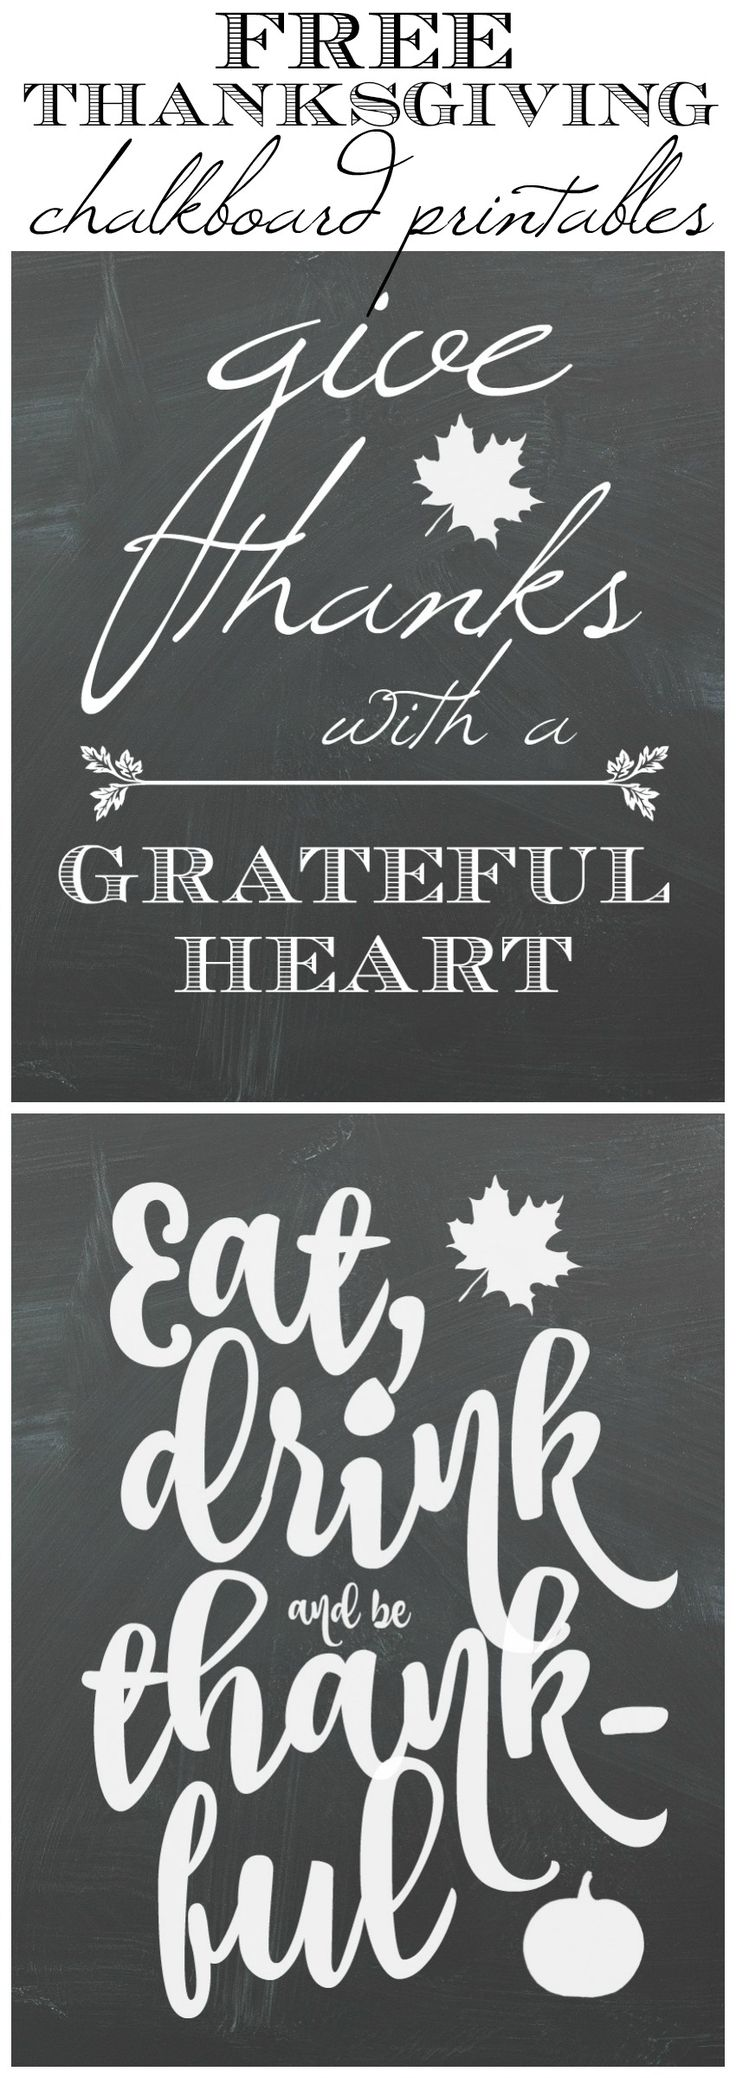 Fall Kitchen Tour & Free Thanksgiving Chalkboard Art Printables